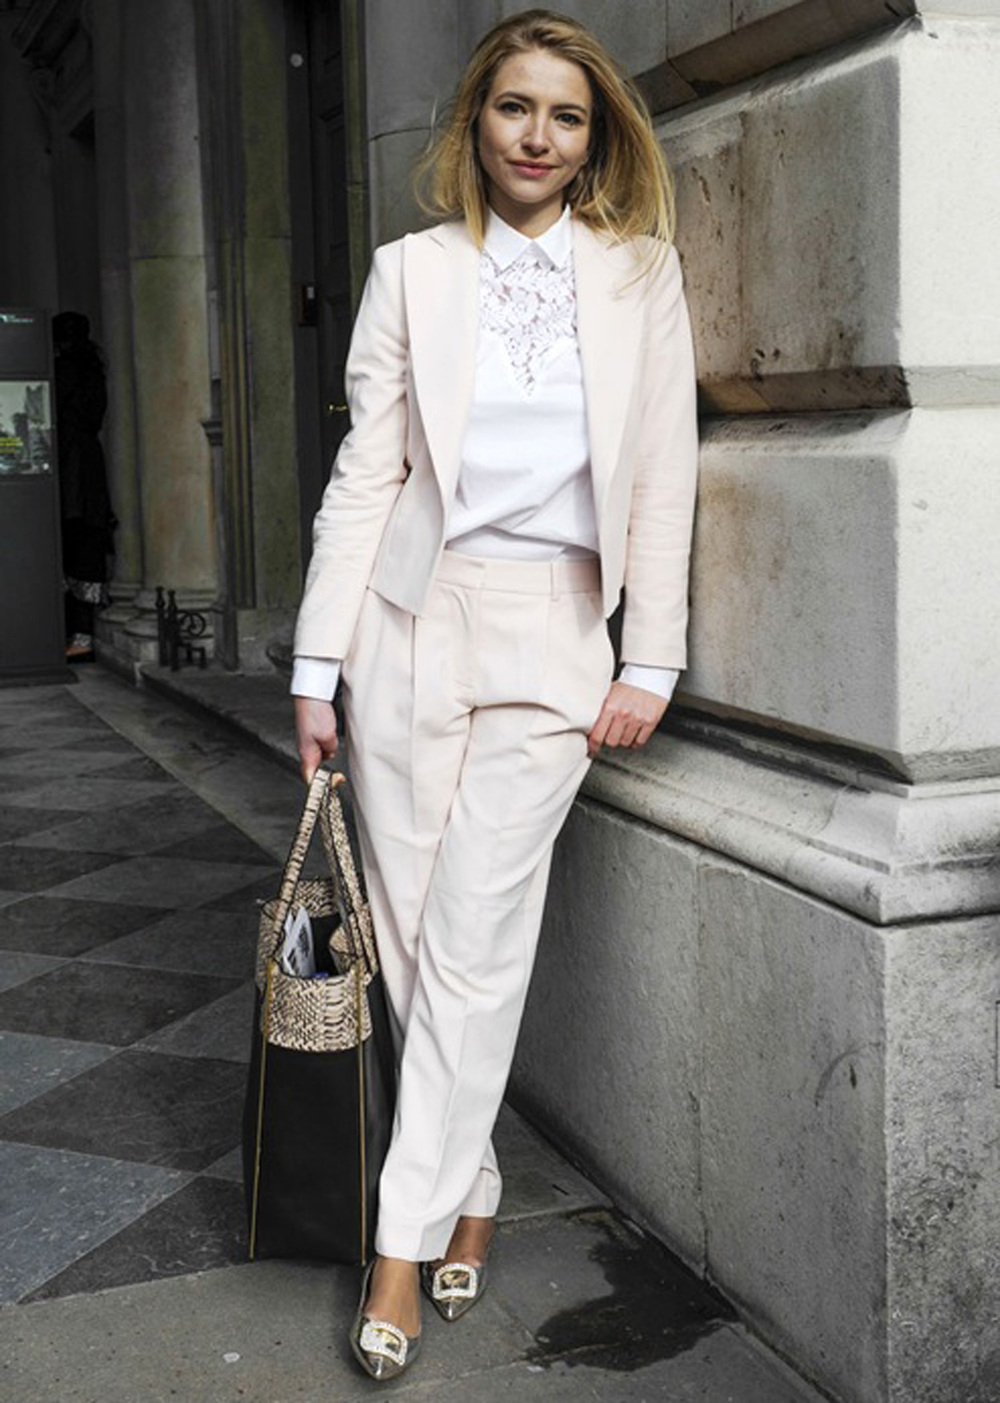 elle canada fed 19 2014 street style 10 perfect boy meets girl looks white shirt 1500.jpg